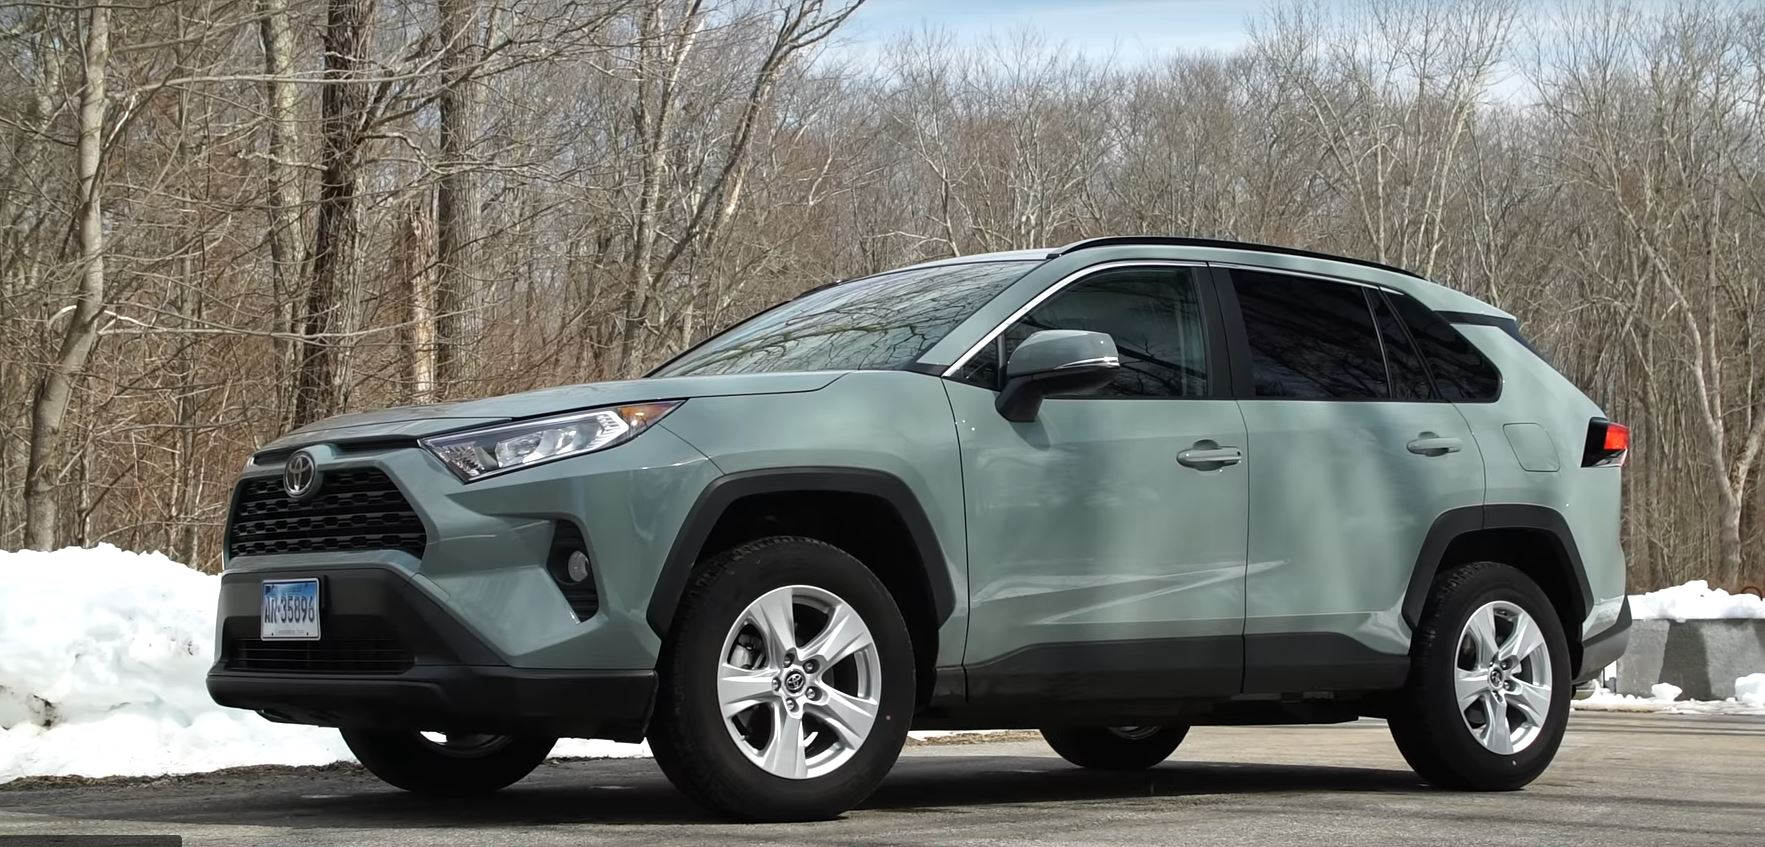 2020 Toyota RAV4: News, Options, Design, Release >> 2020 Toyota Rav4 Is Less Comfortable Than Mazda Cx 5 Says